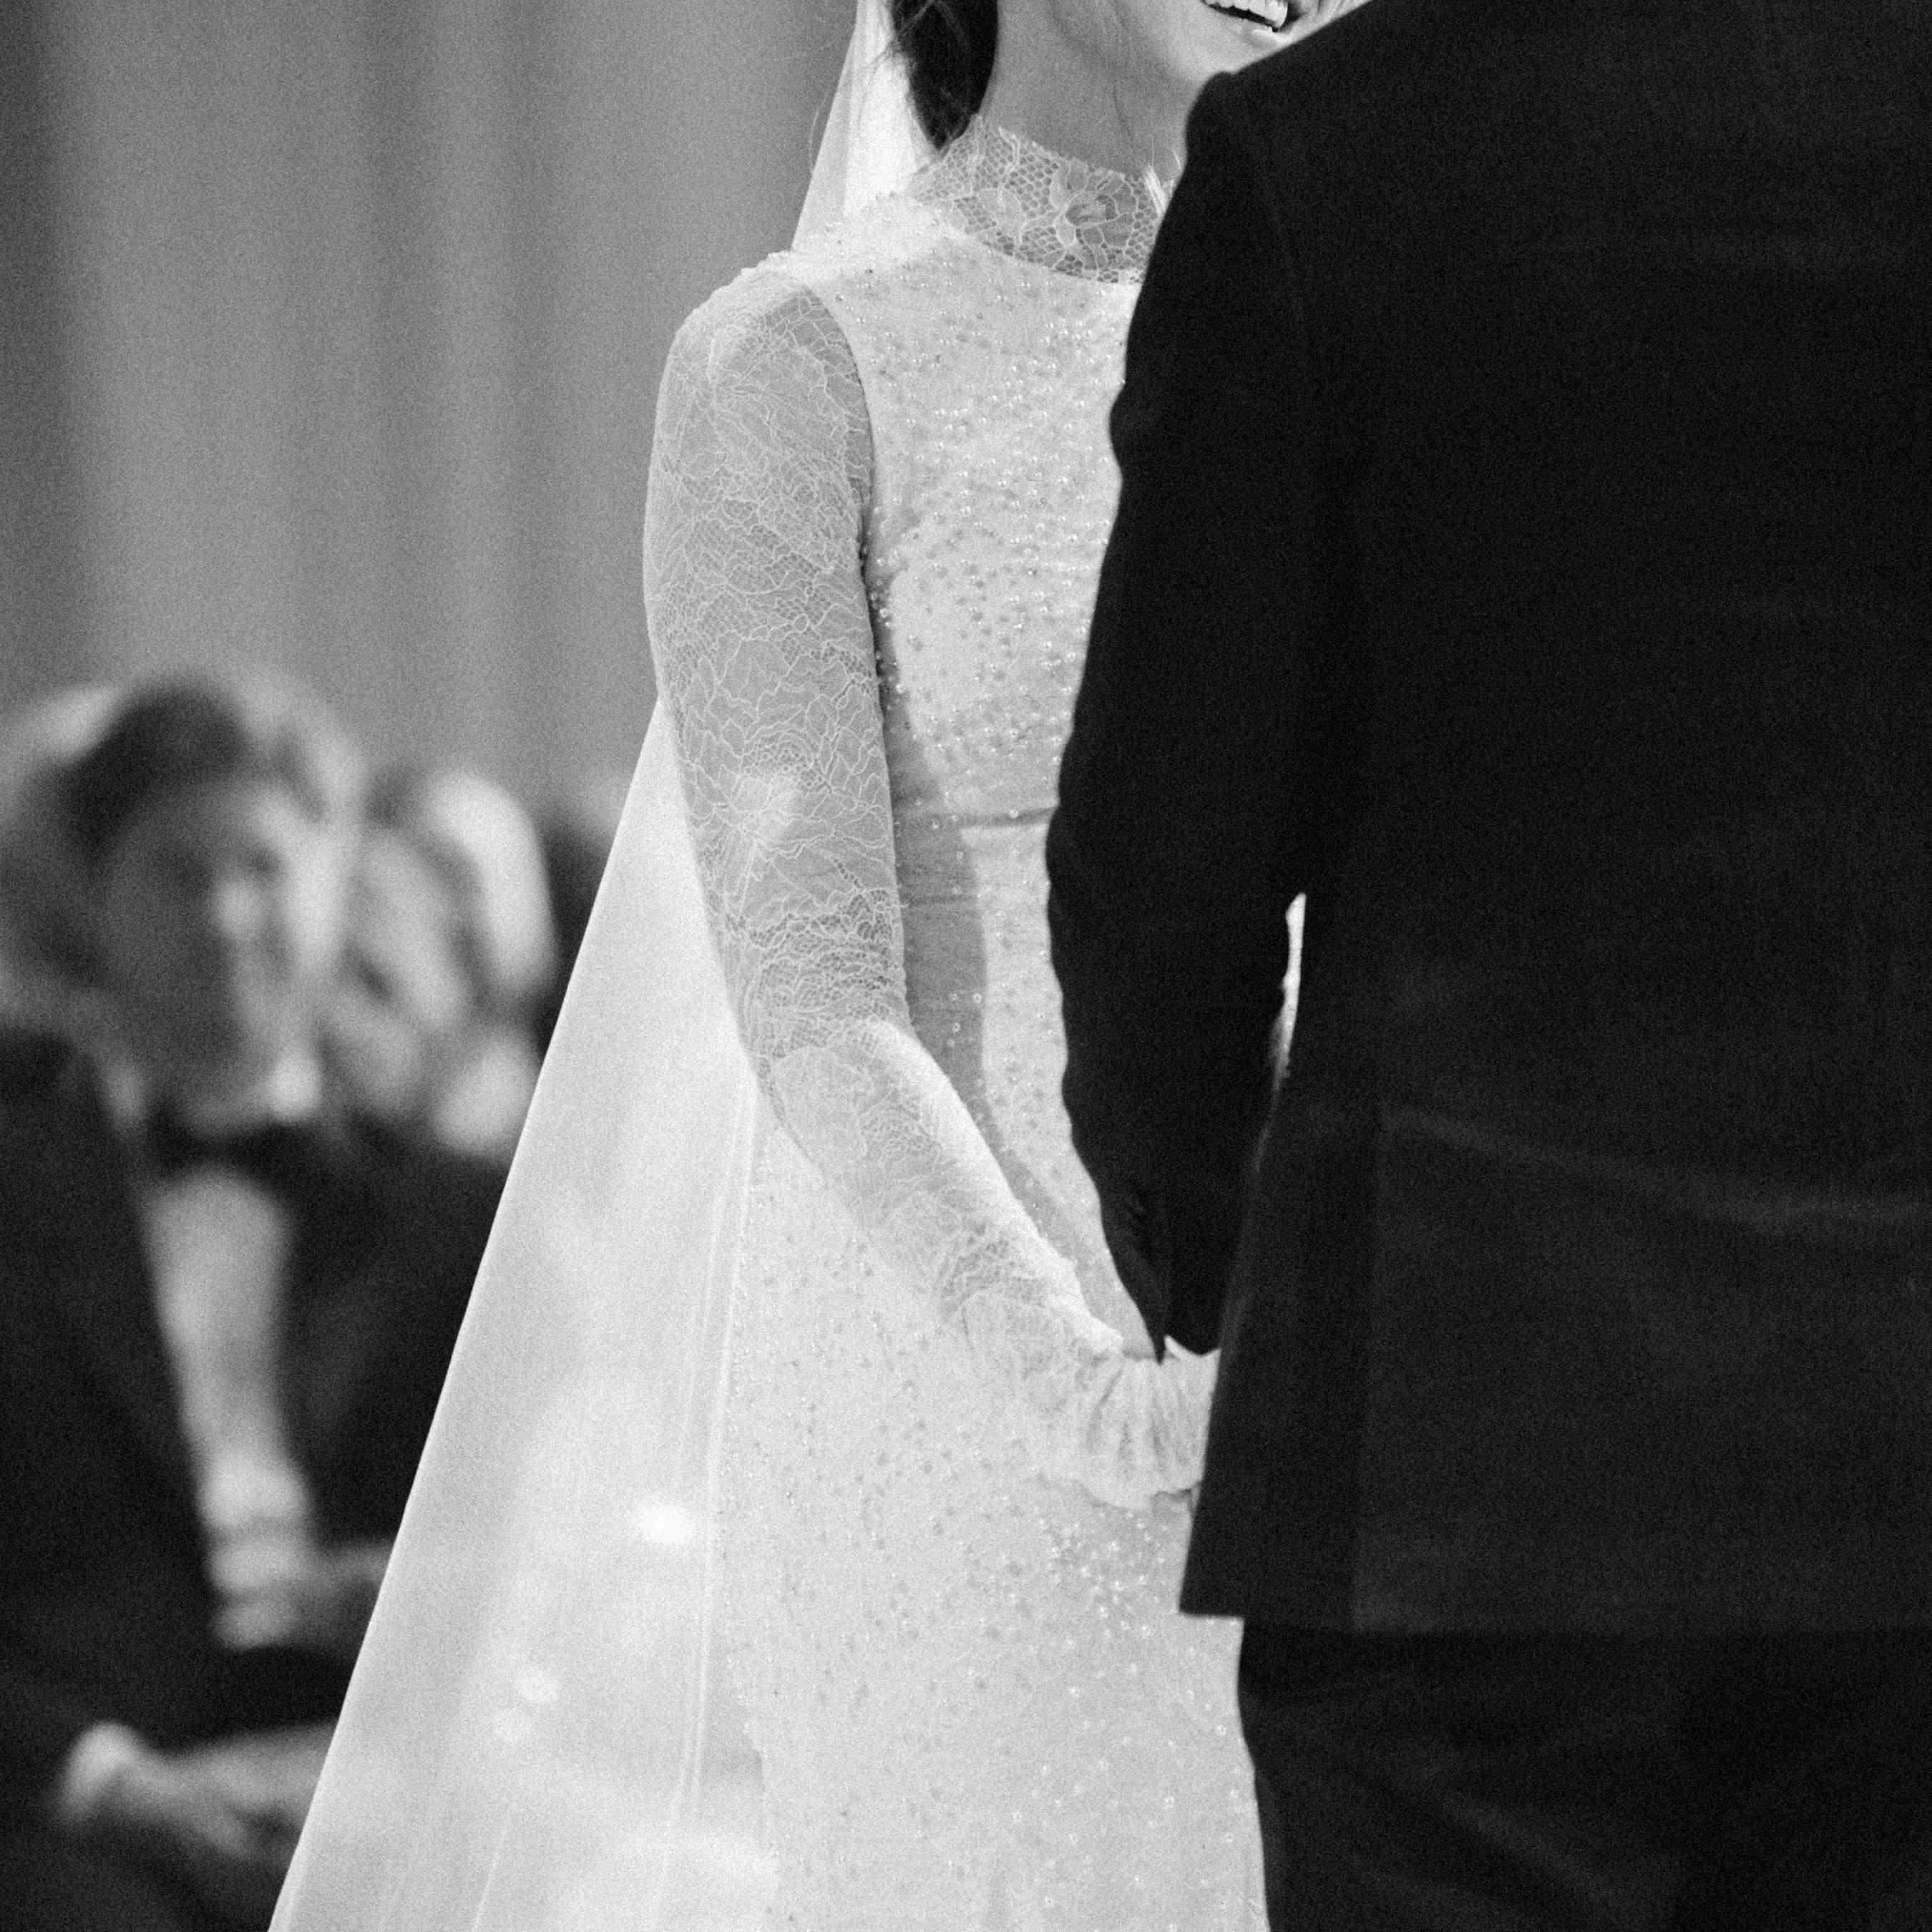 <p>Bride smiling at groom</p><br><br>